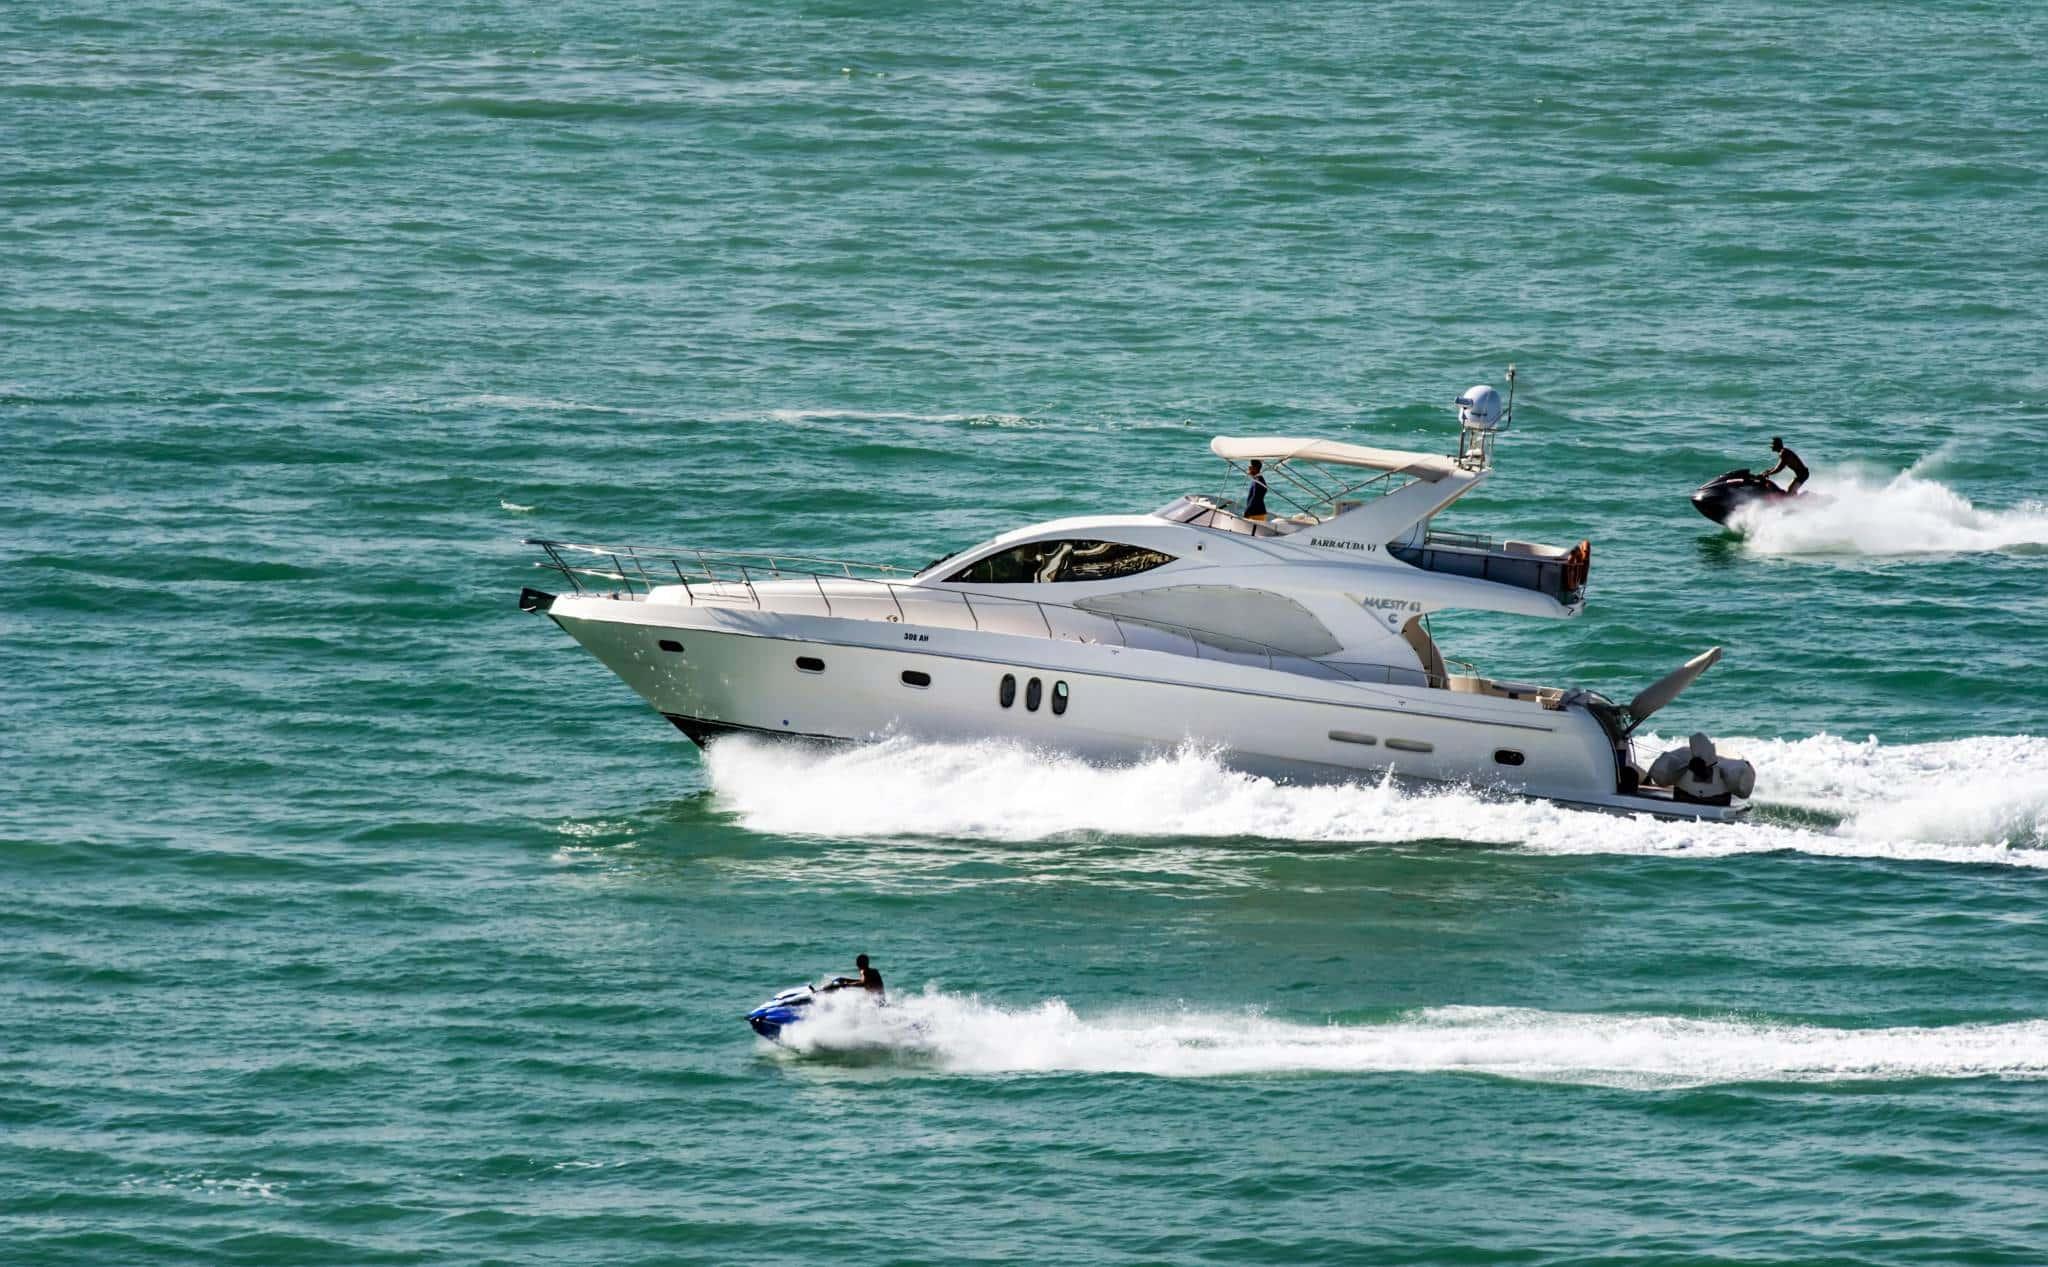 action boat jetski power boat leisure